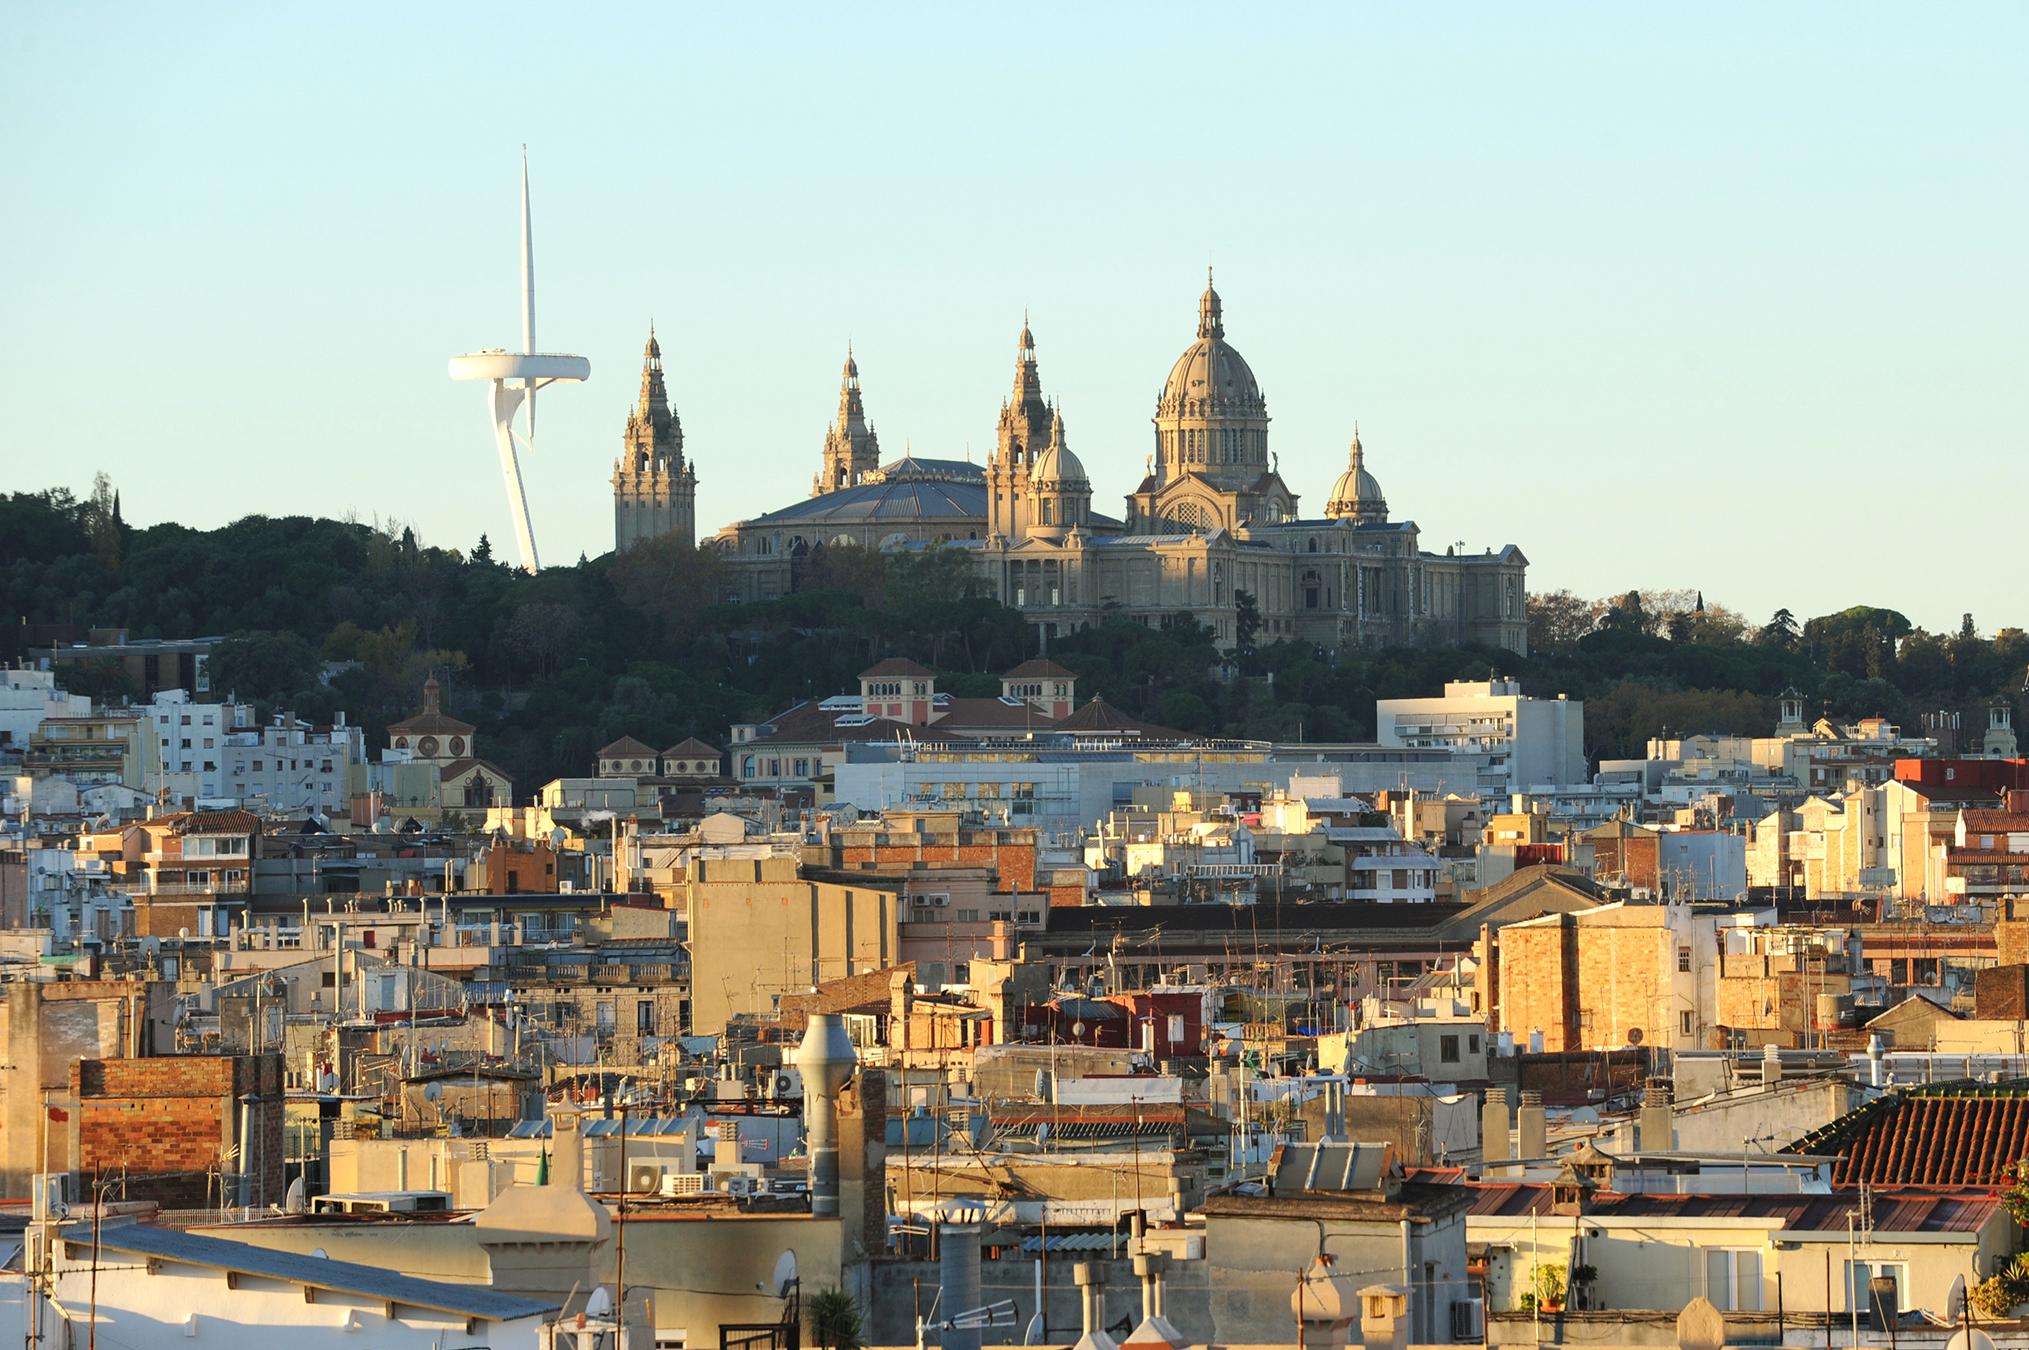 Montjuic, Barcelona, Espanja, matkablogi, matka